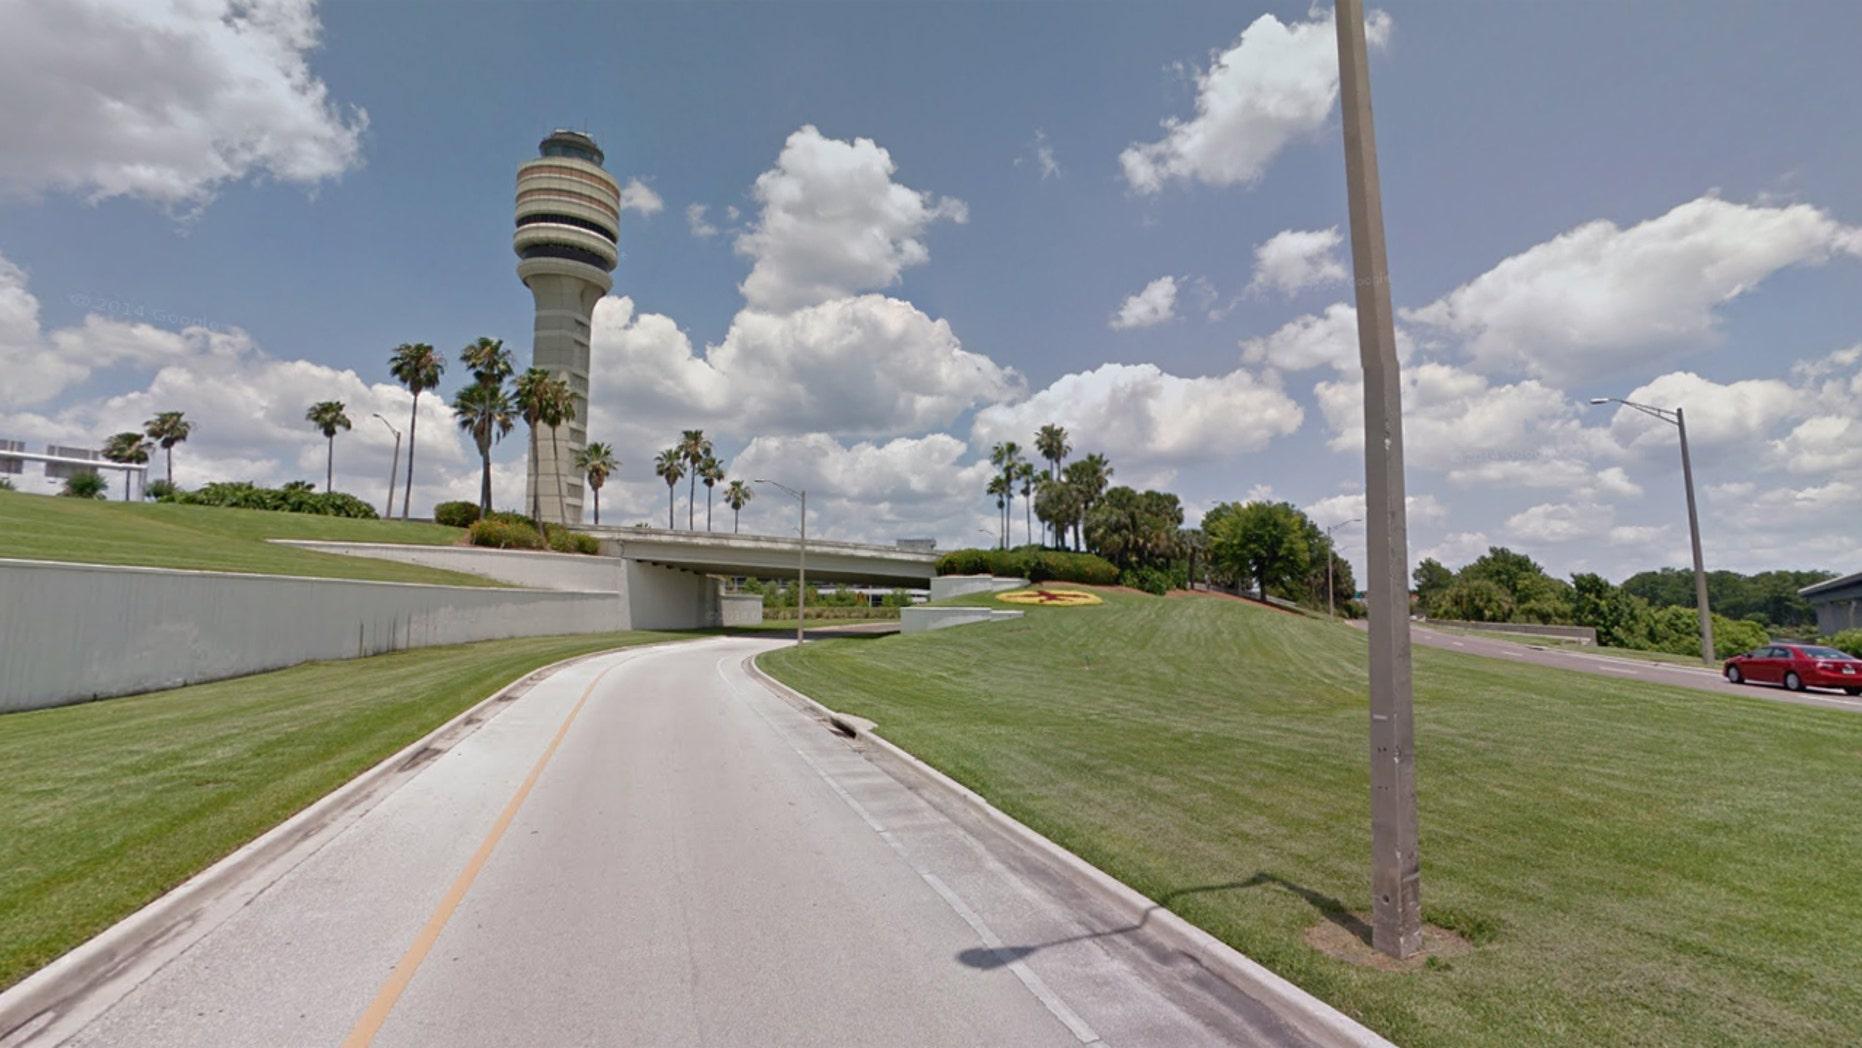 The exterior of the Orlando International Airport